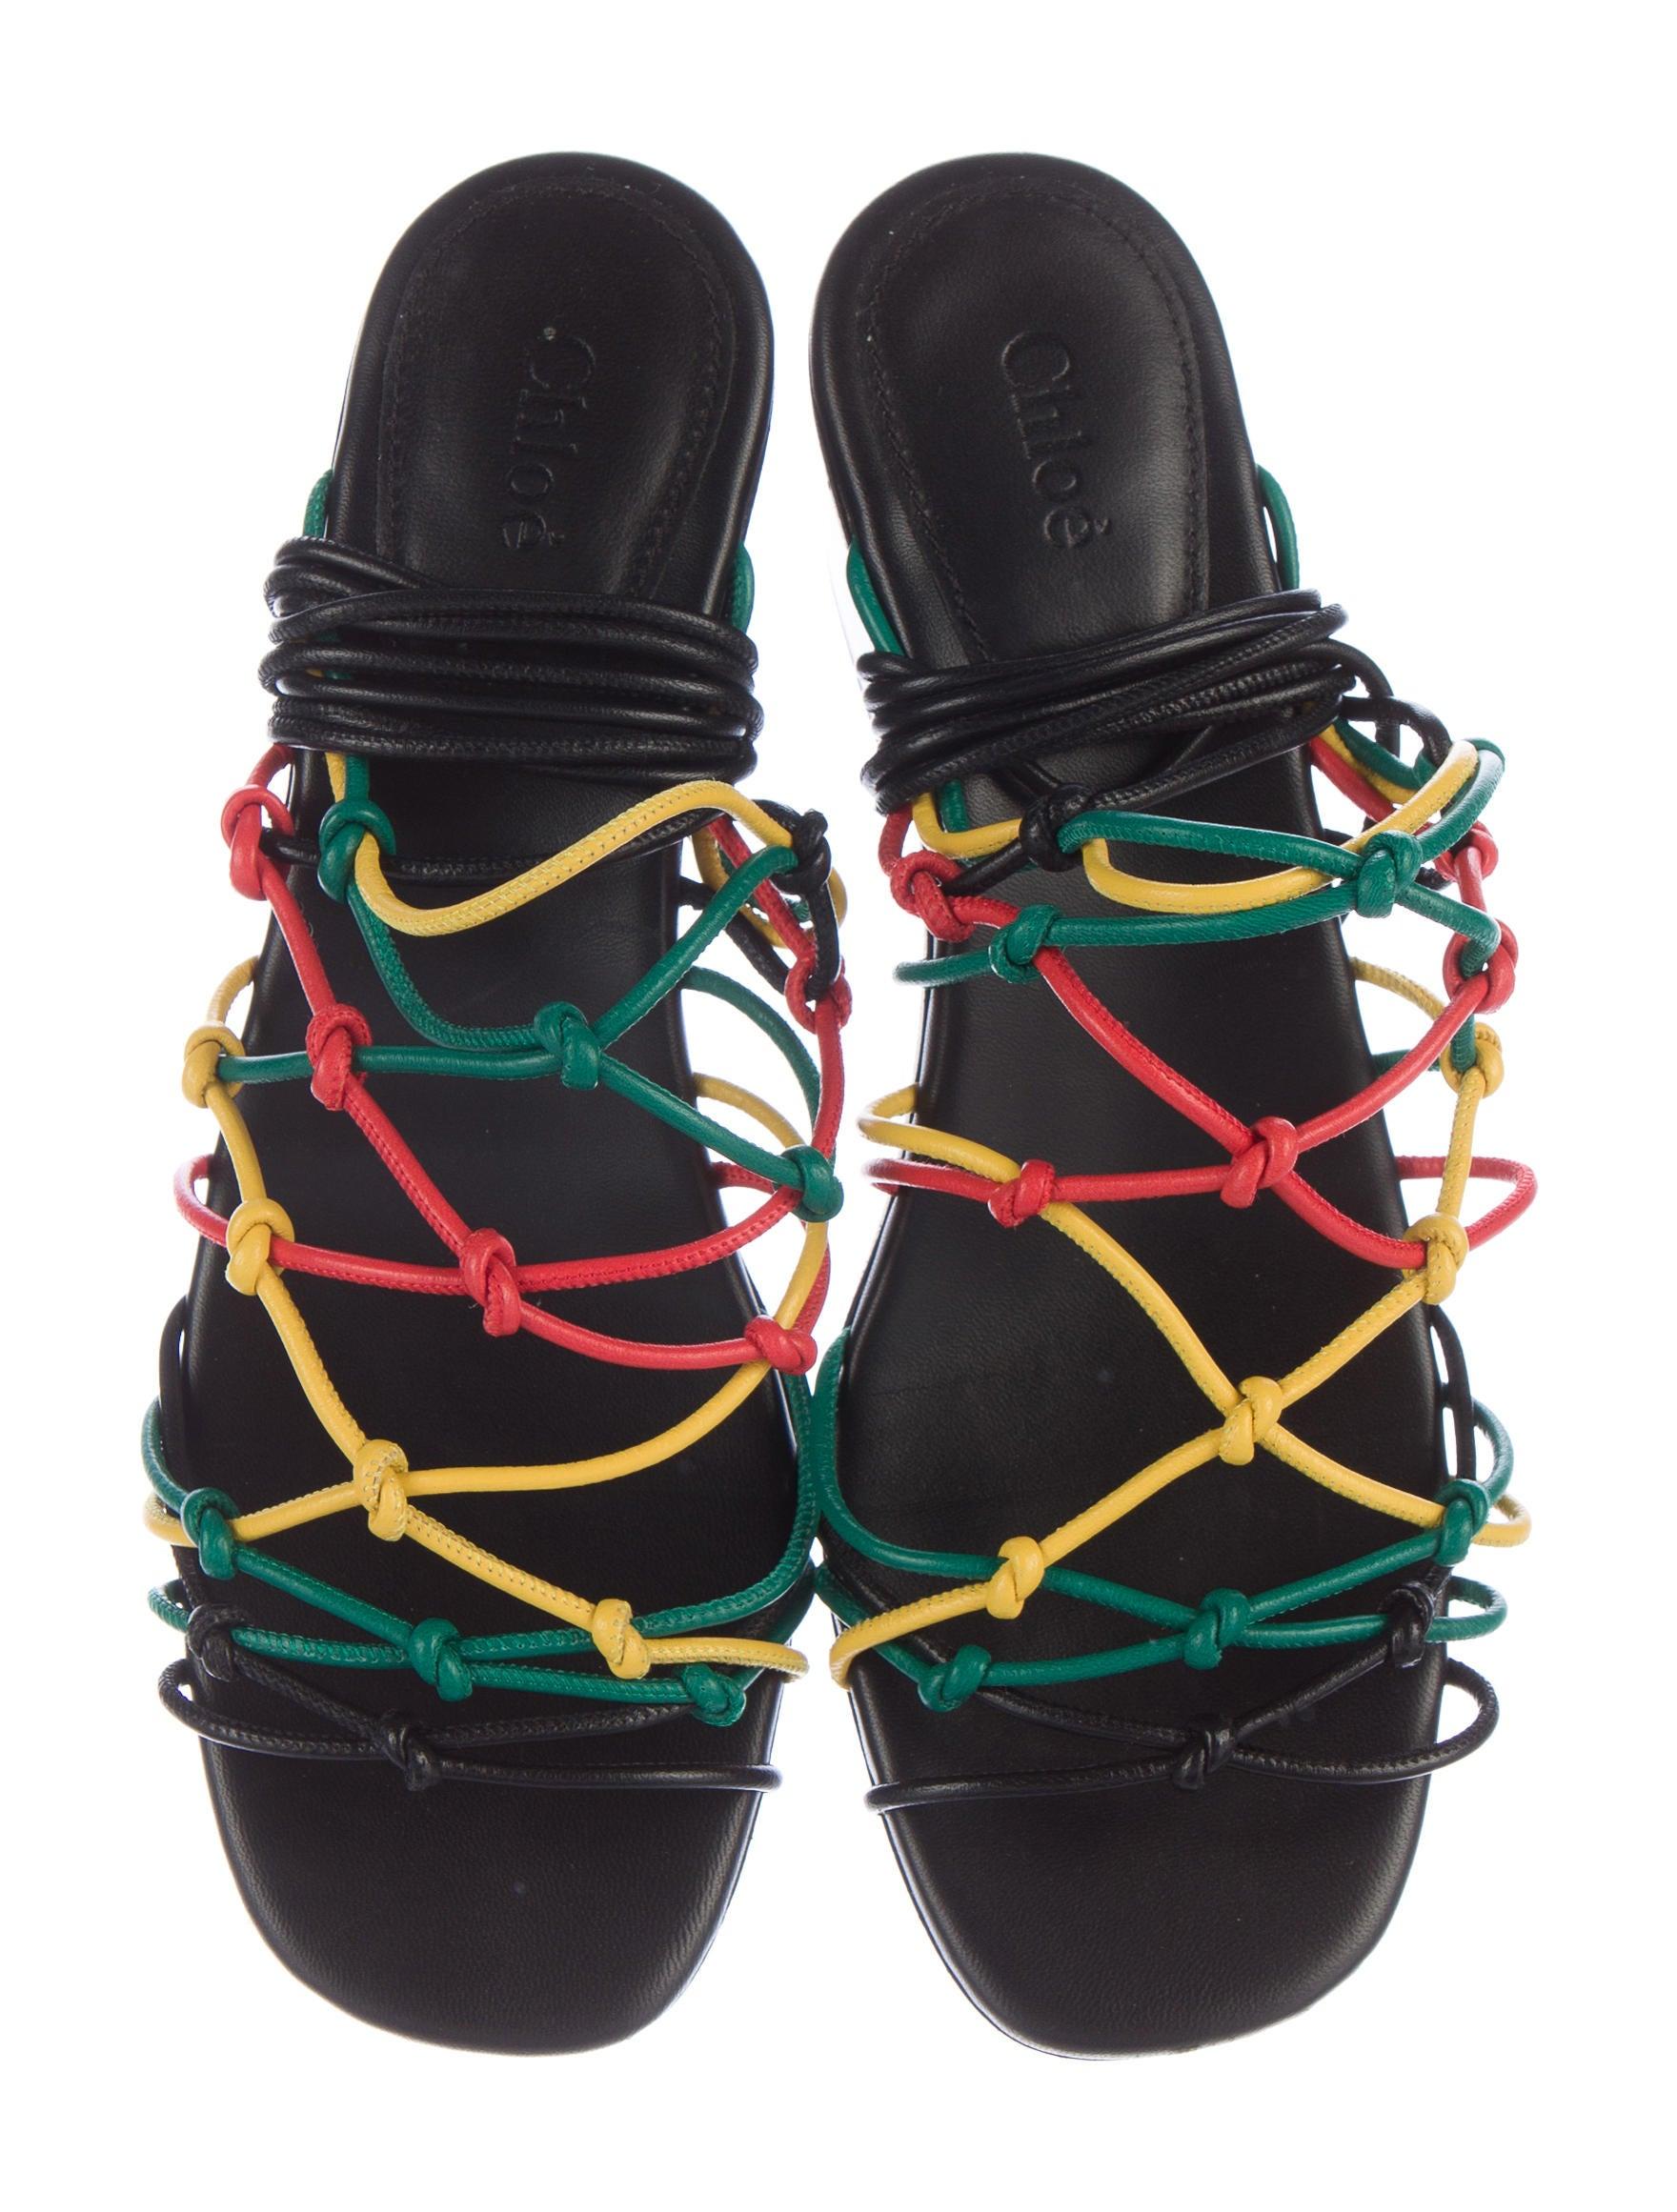 Jamaican sandals shoes - Jamaica Leather Sandals